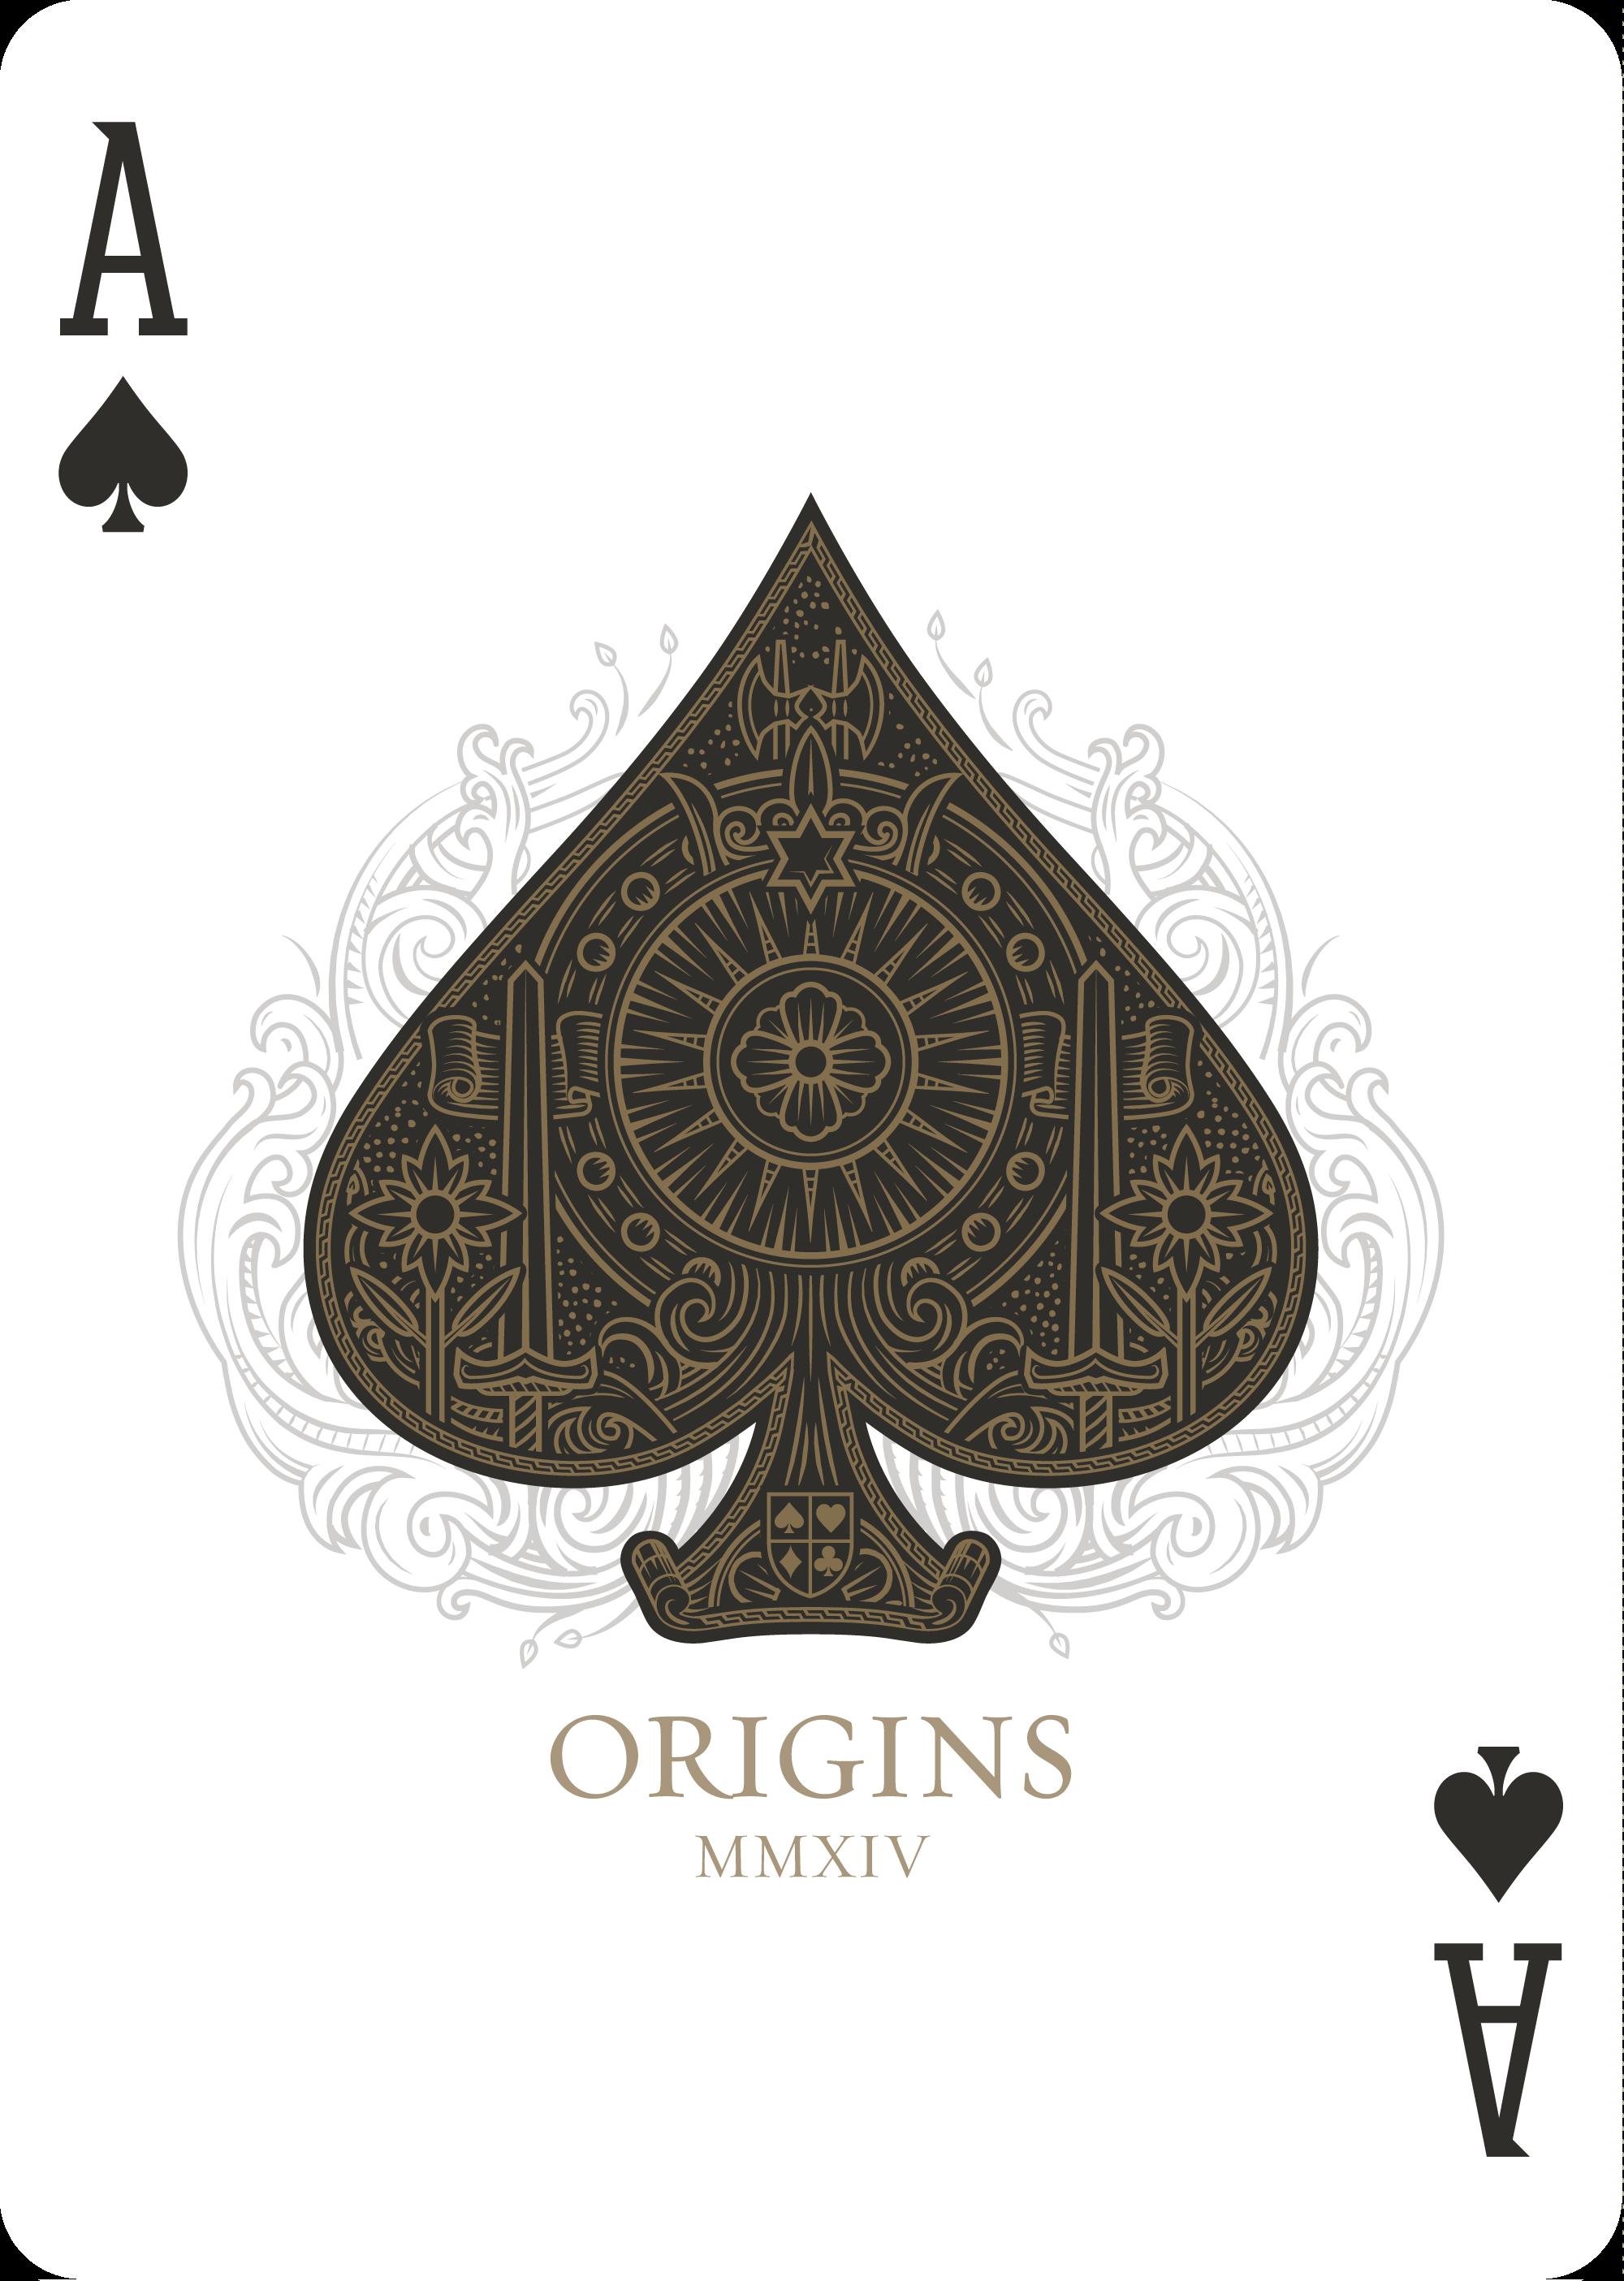 Wedding Rings Clip Art Free Download Ace of Spades   Origin...